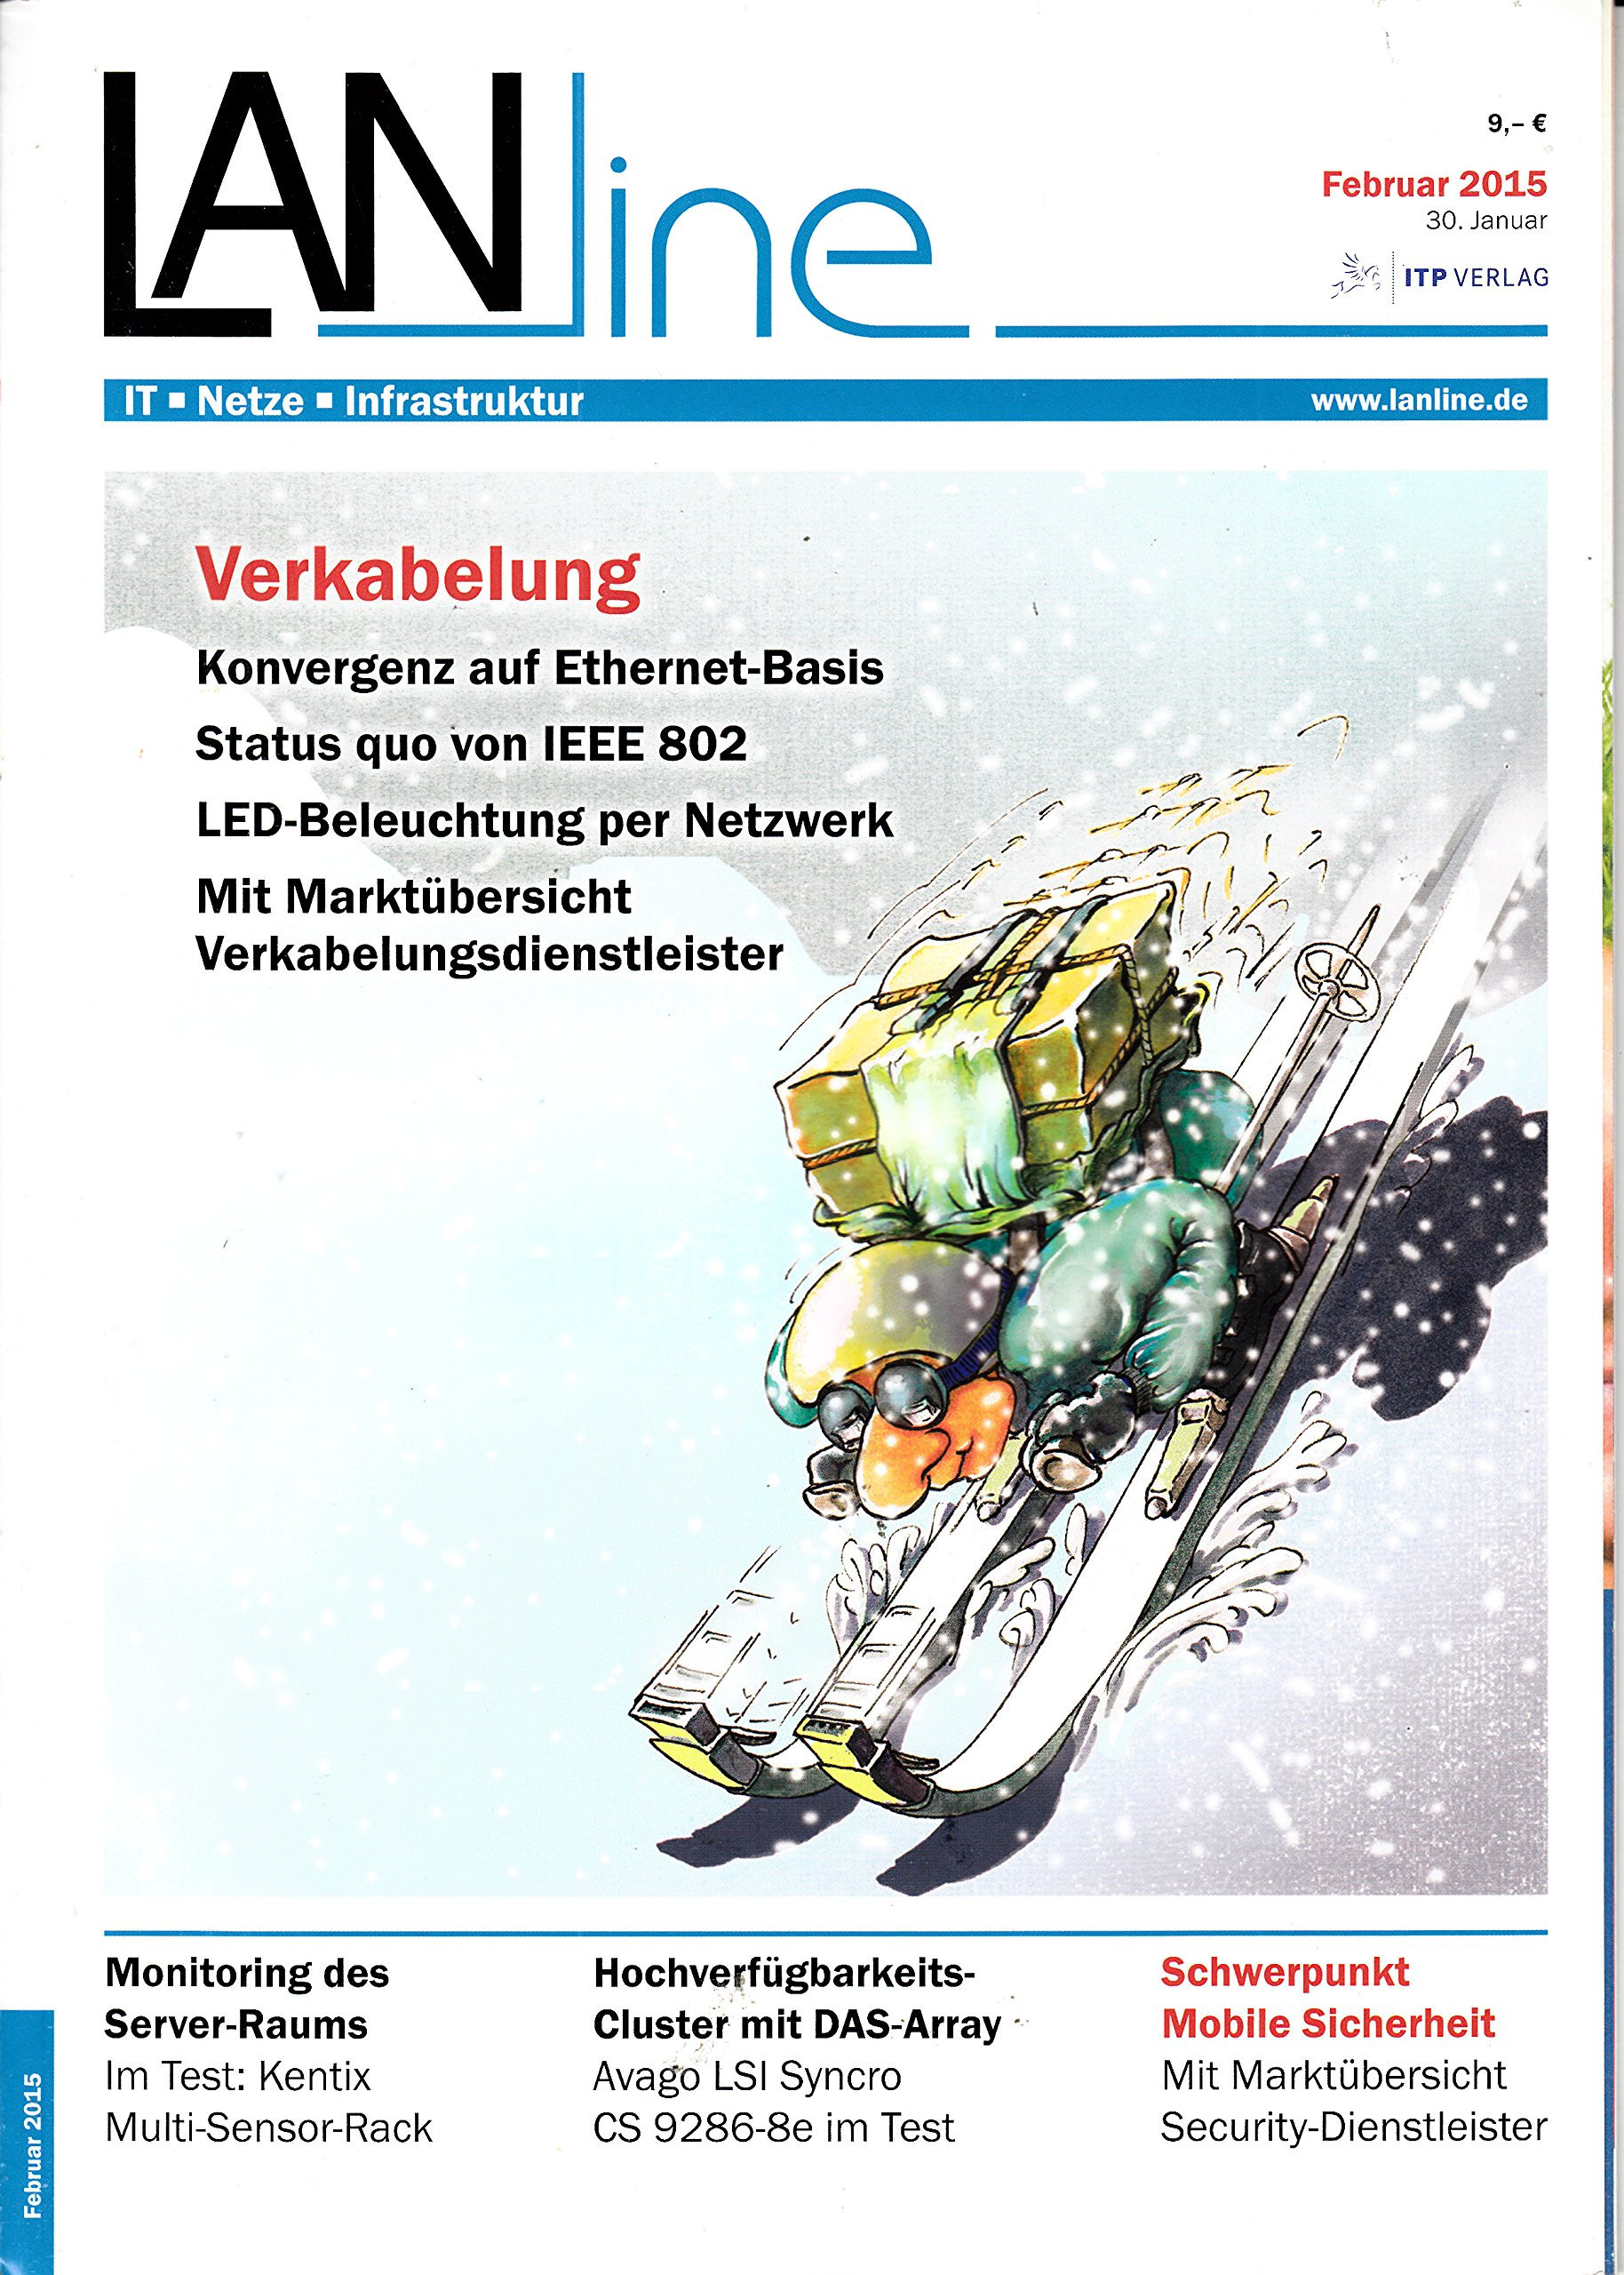 Atemberaubend Heimverkabelungsbücher Ideen - Der Schaltplan - greigo.com